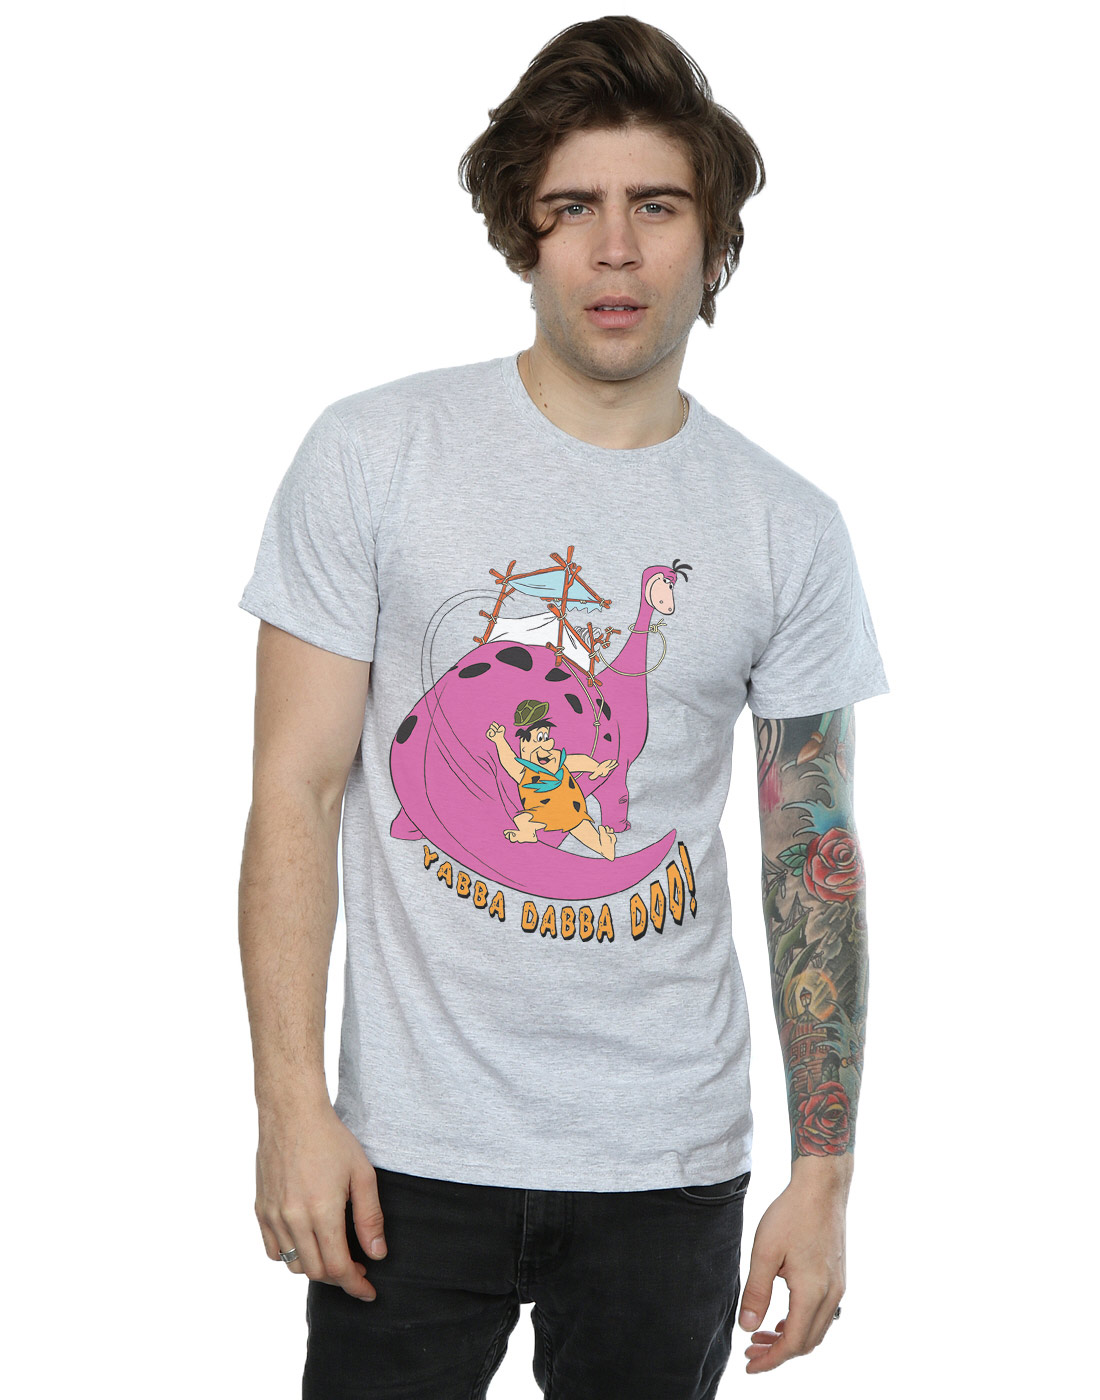 The-Flintstones-Homme-Yabba-Dabba-Doo-T-Shirt